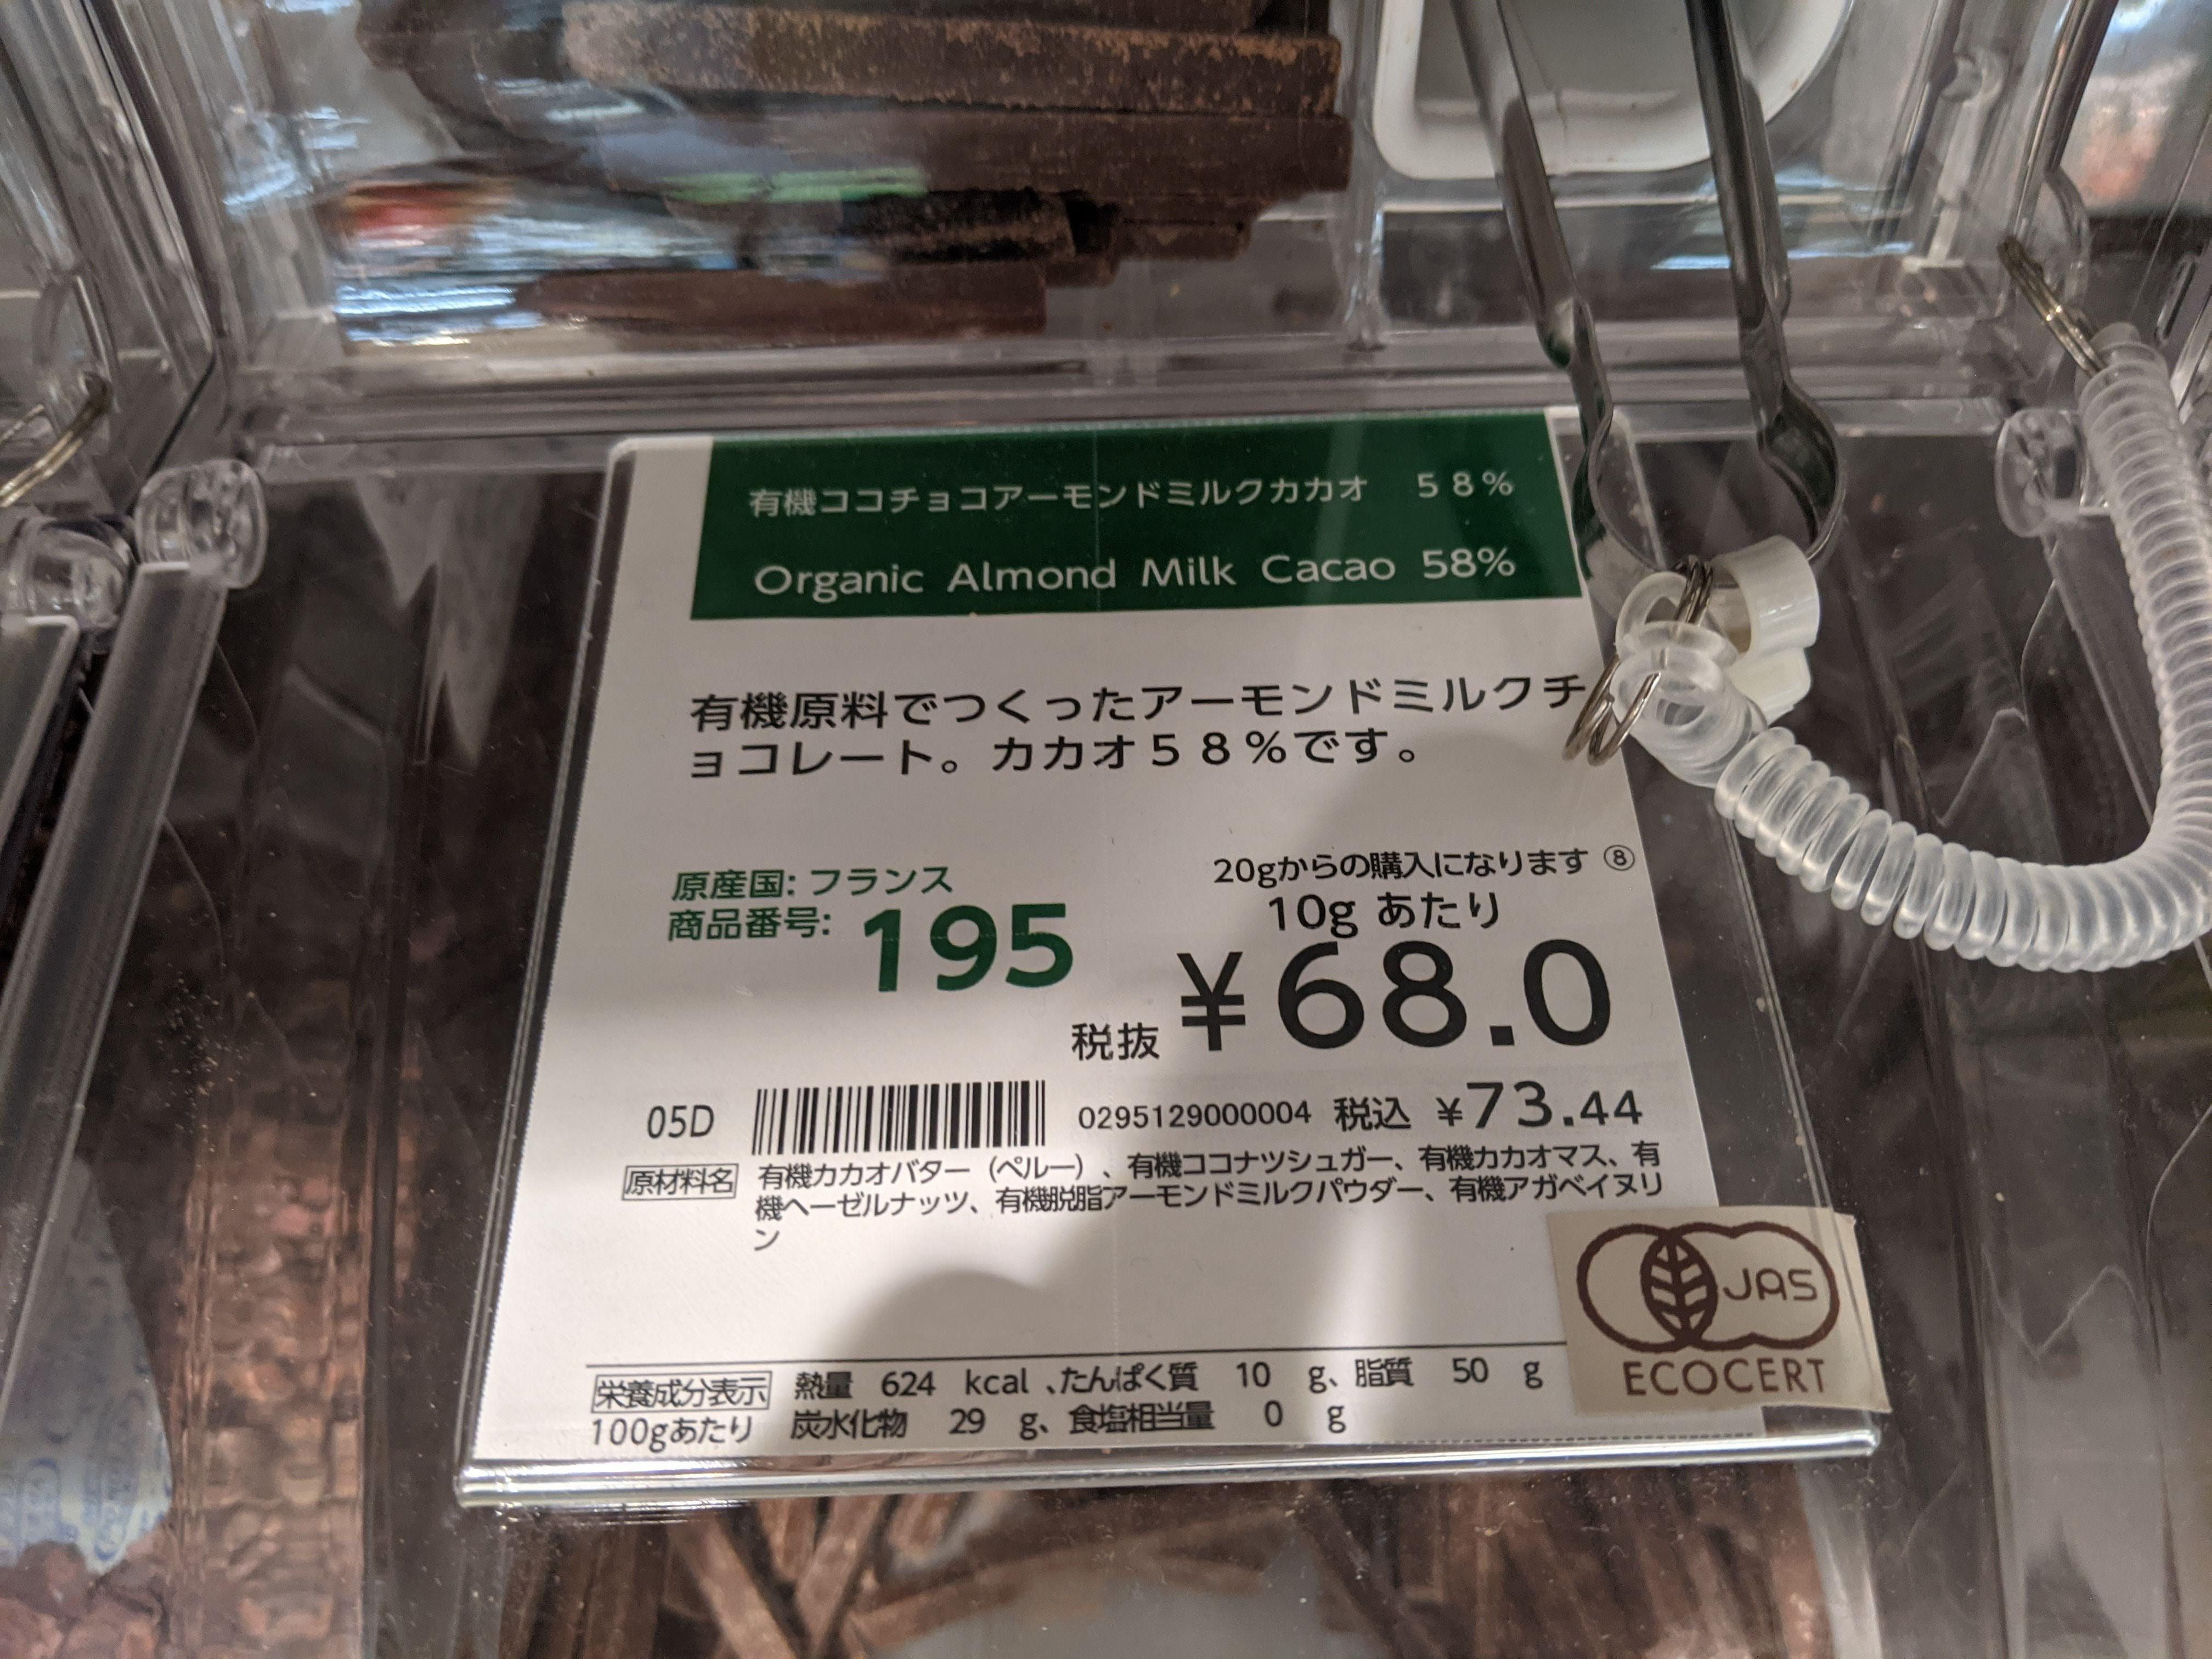 Bio C Bon Organic Almond Milk Cacao